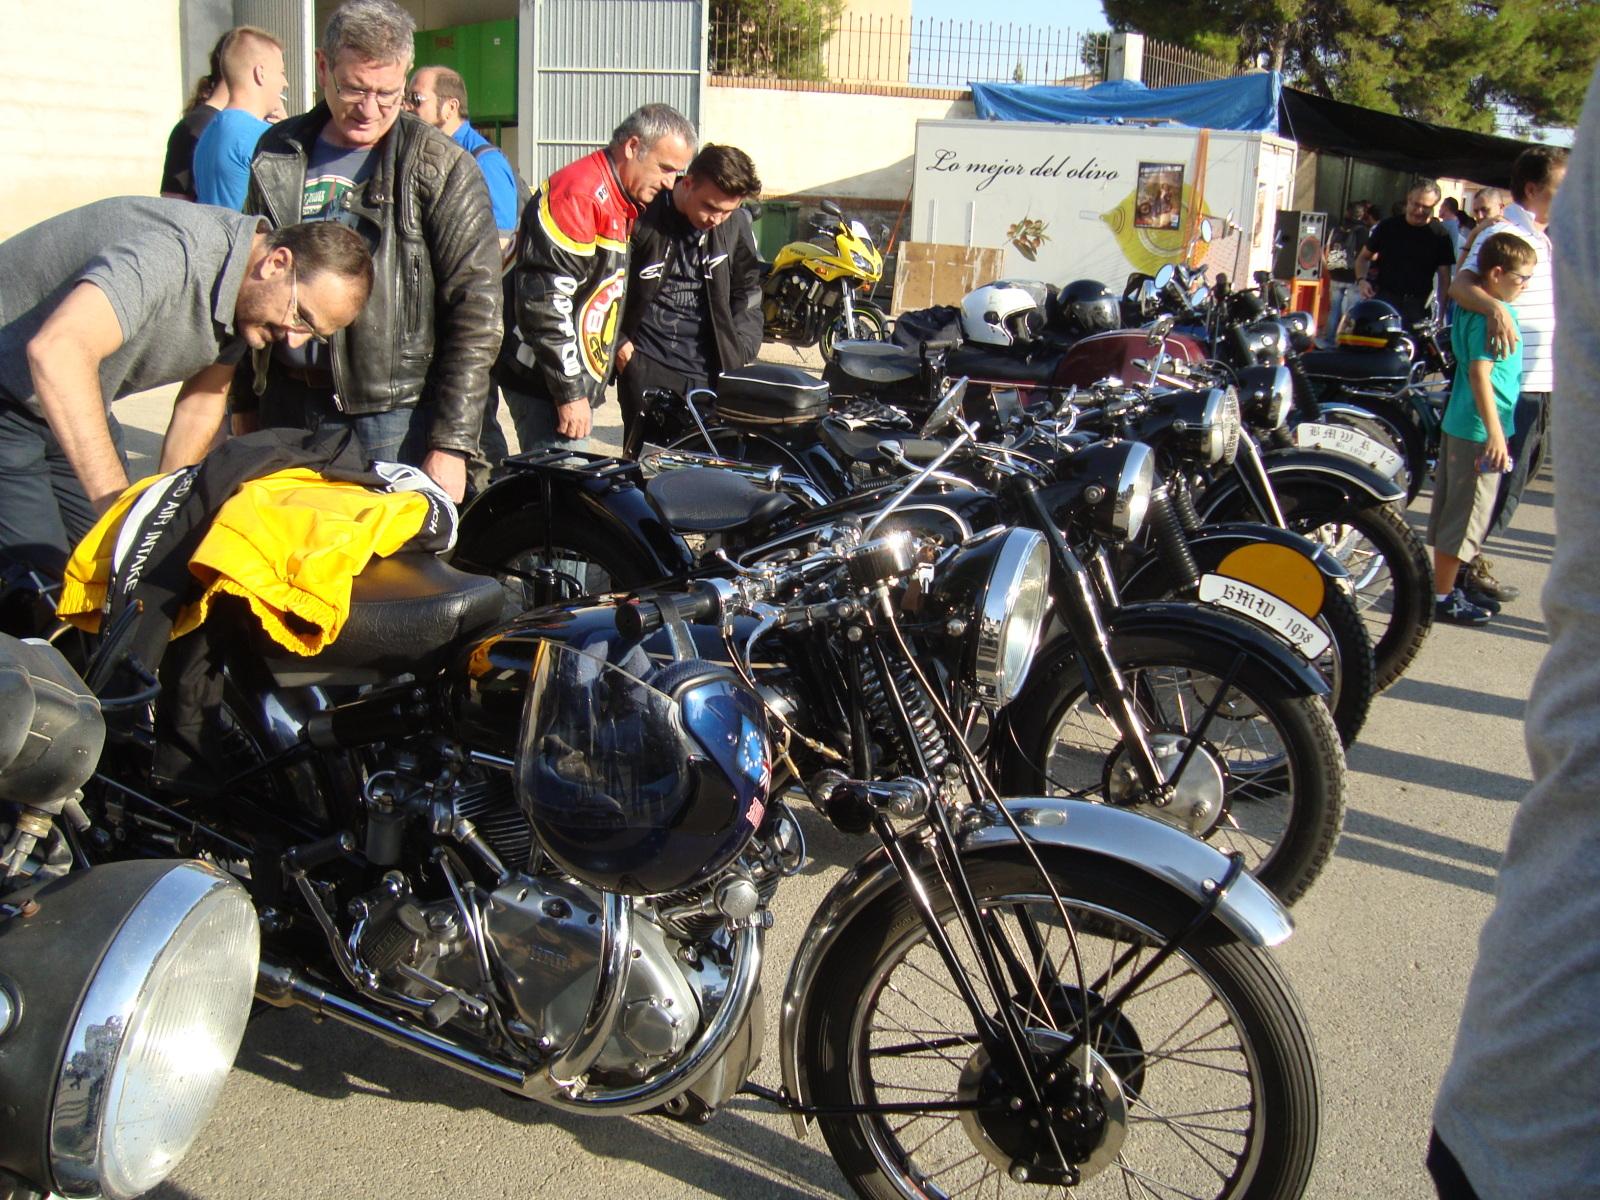 XI concentracion de motos antiguas en Alberuela de tubo (Huesca) 1z2f1qq